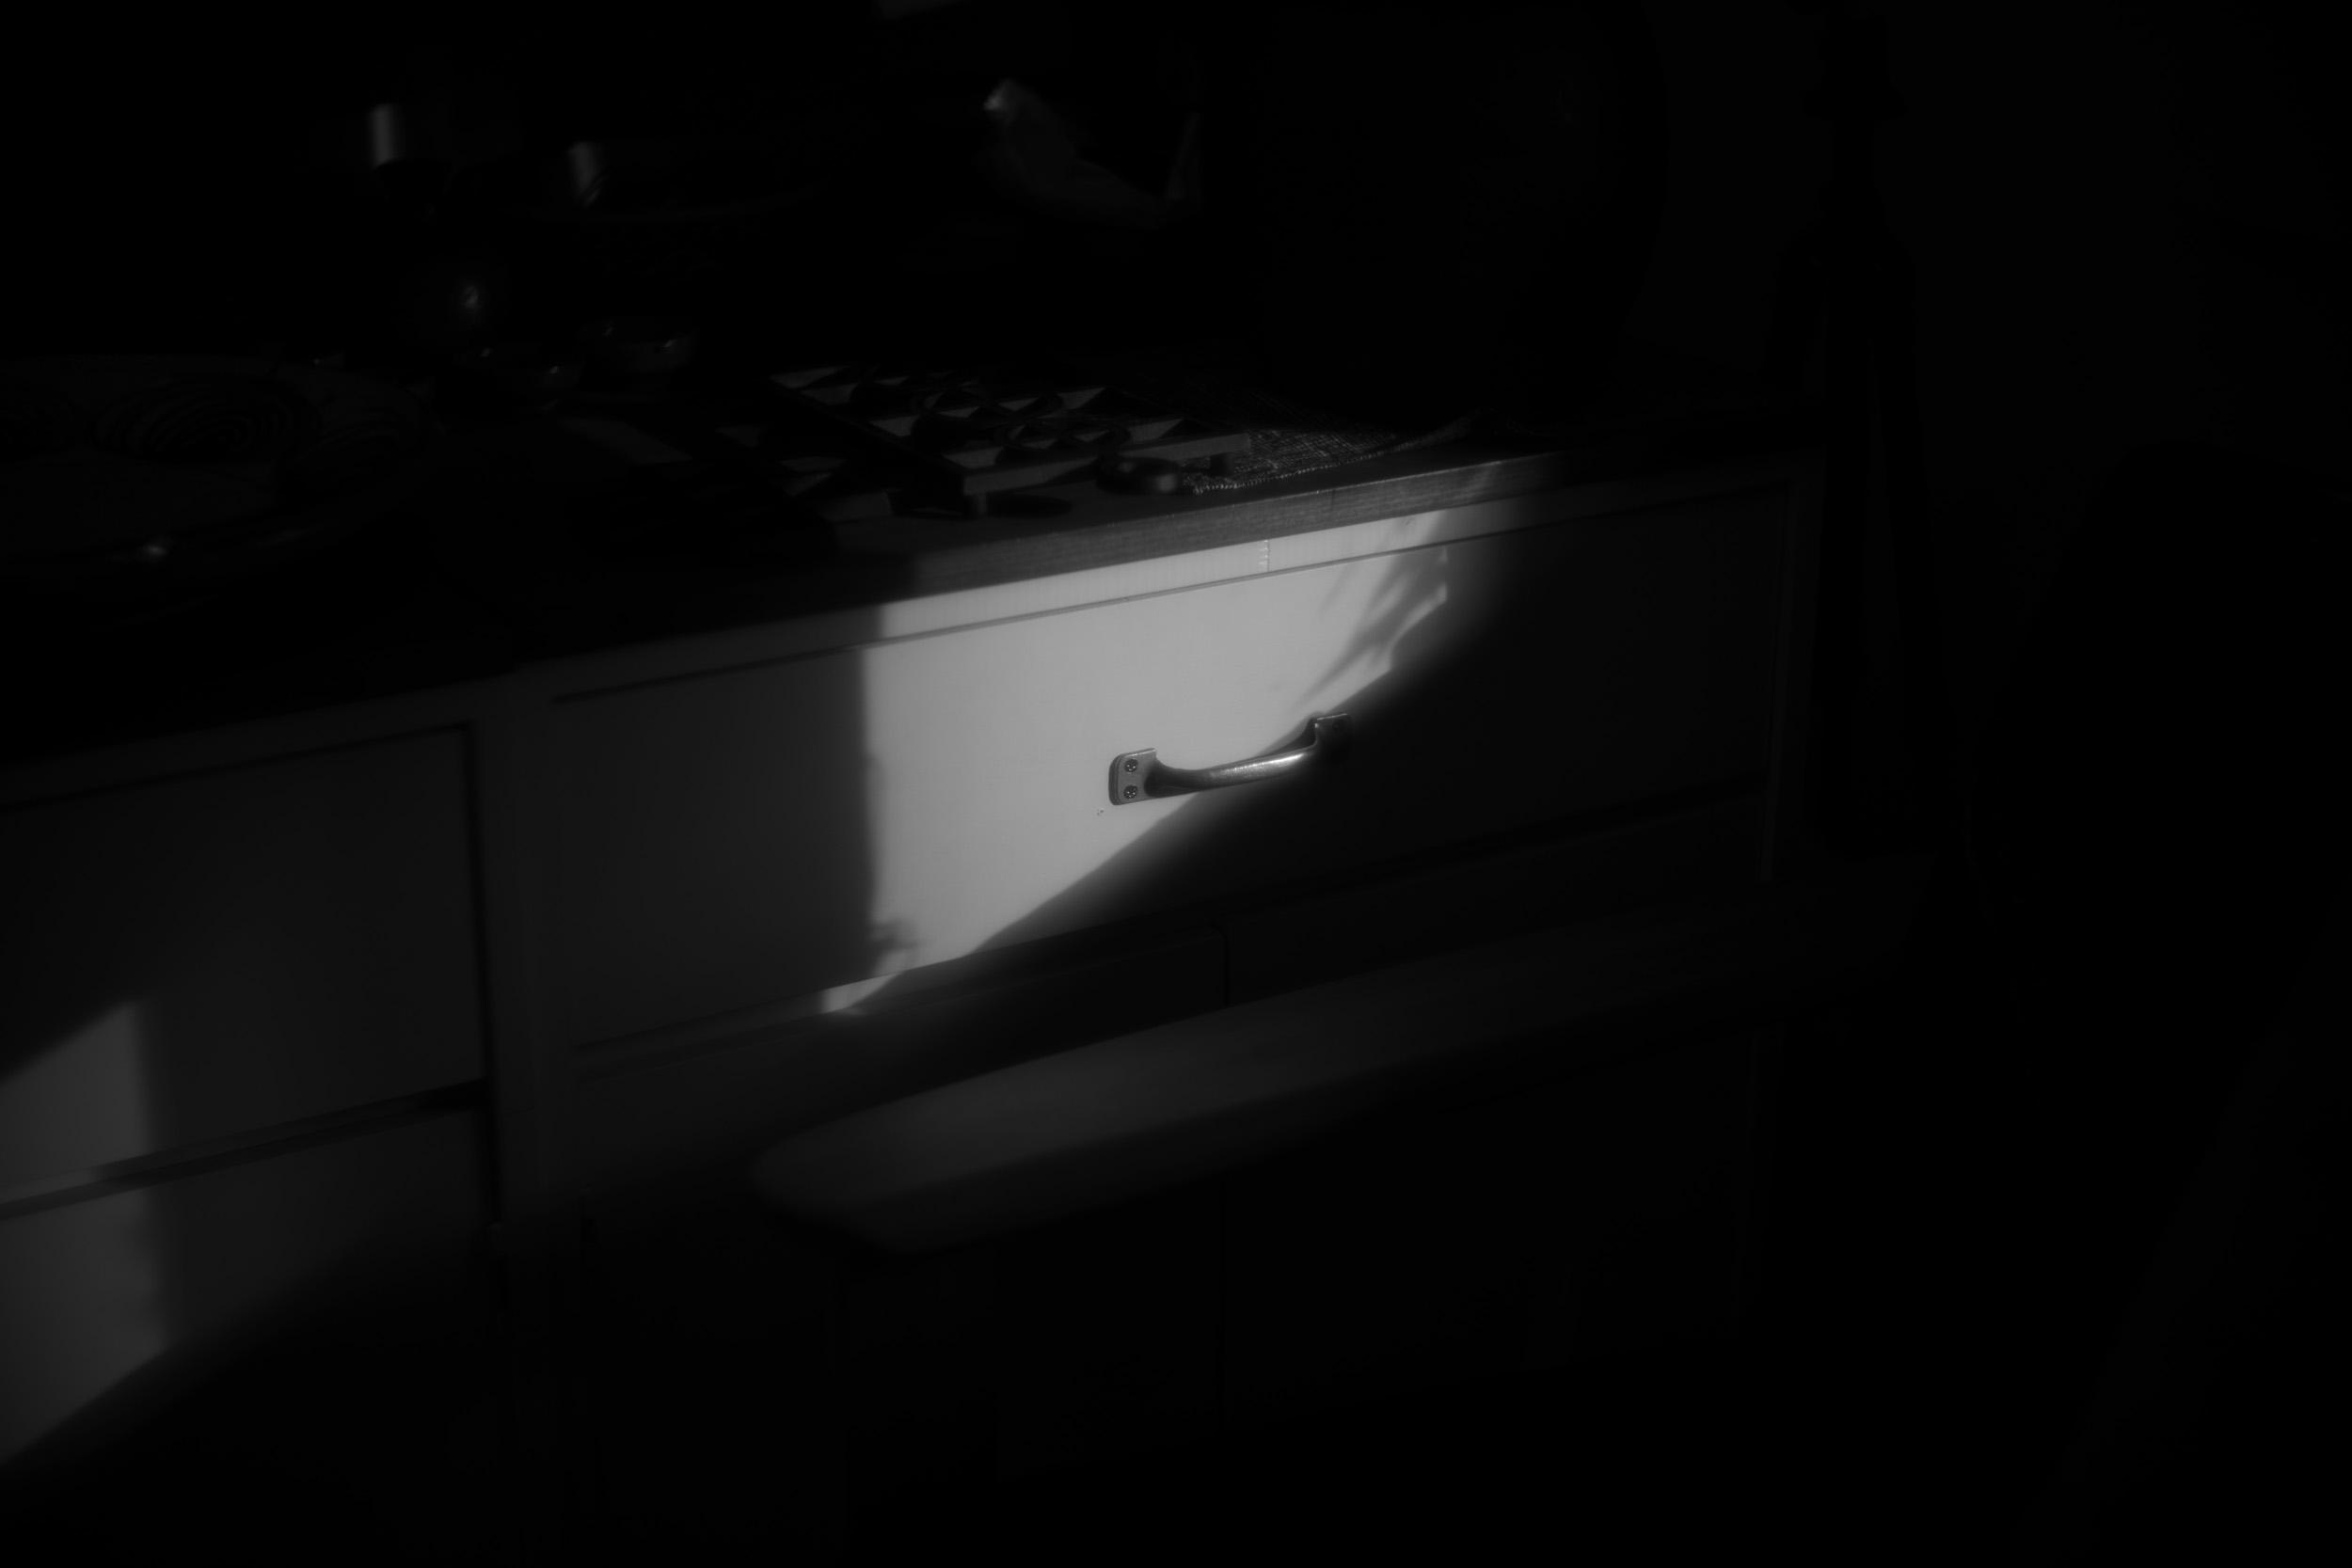 013644_16_leica_copy_zunow_50mm_f1.1_l_black